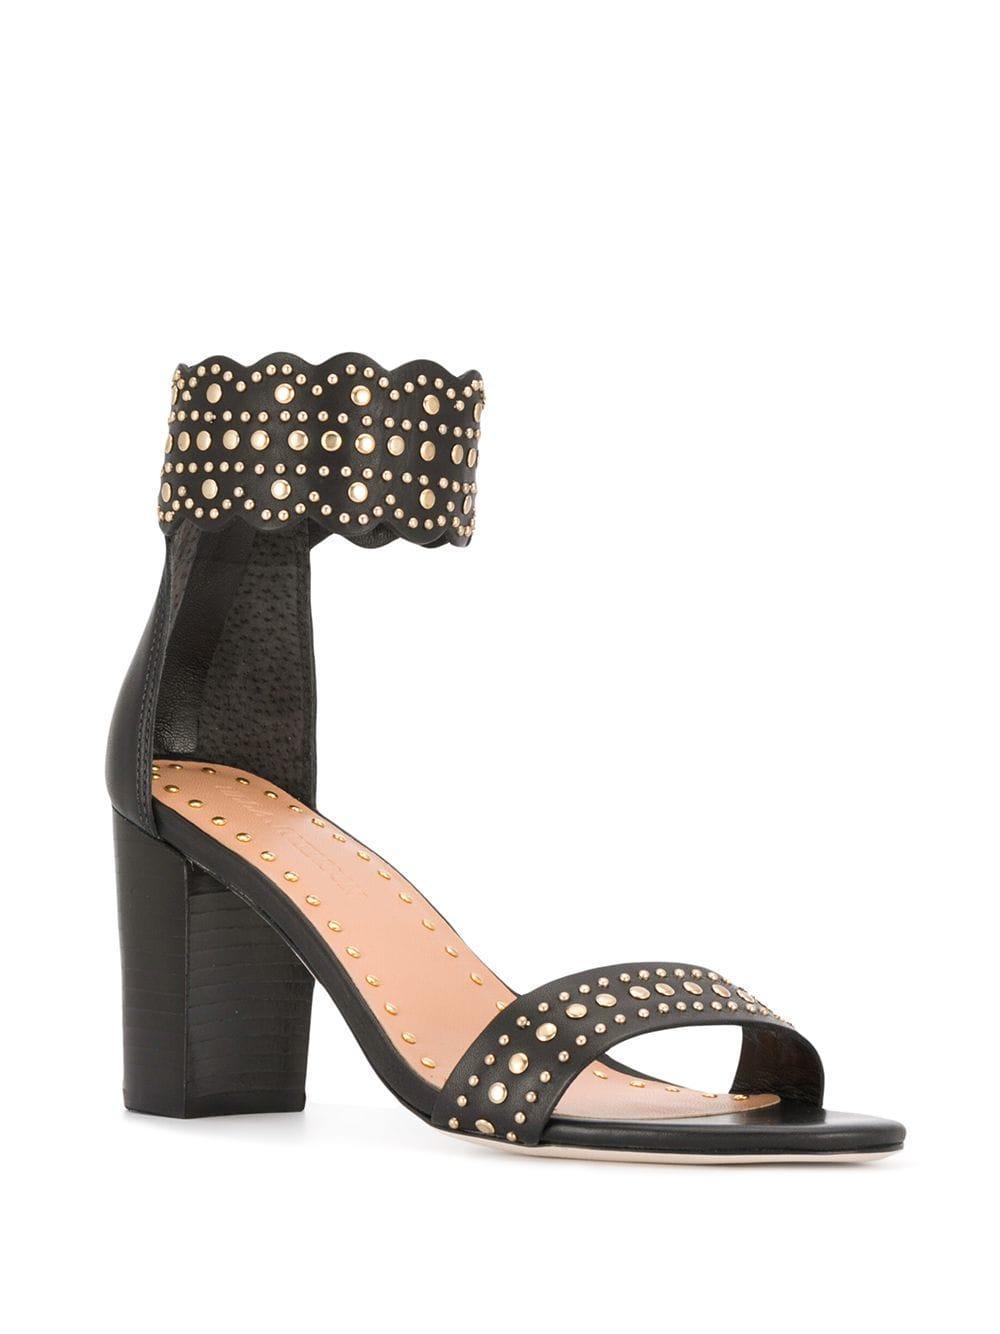 b5b11f284302 Lyst - Ulla Johnson Solange Sandals in Black